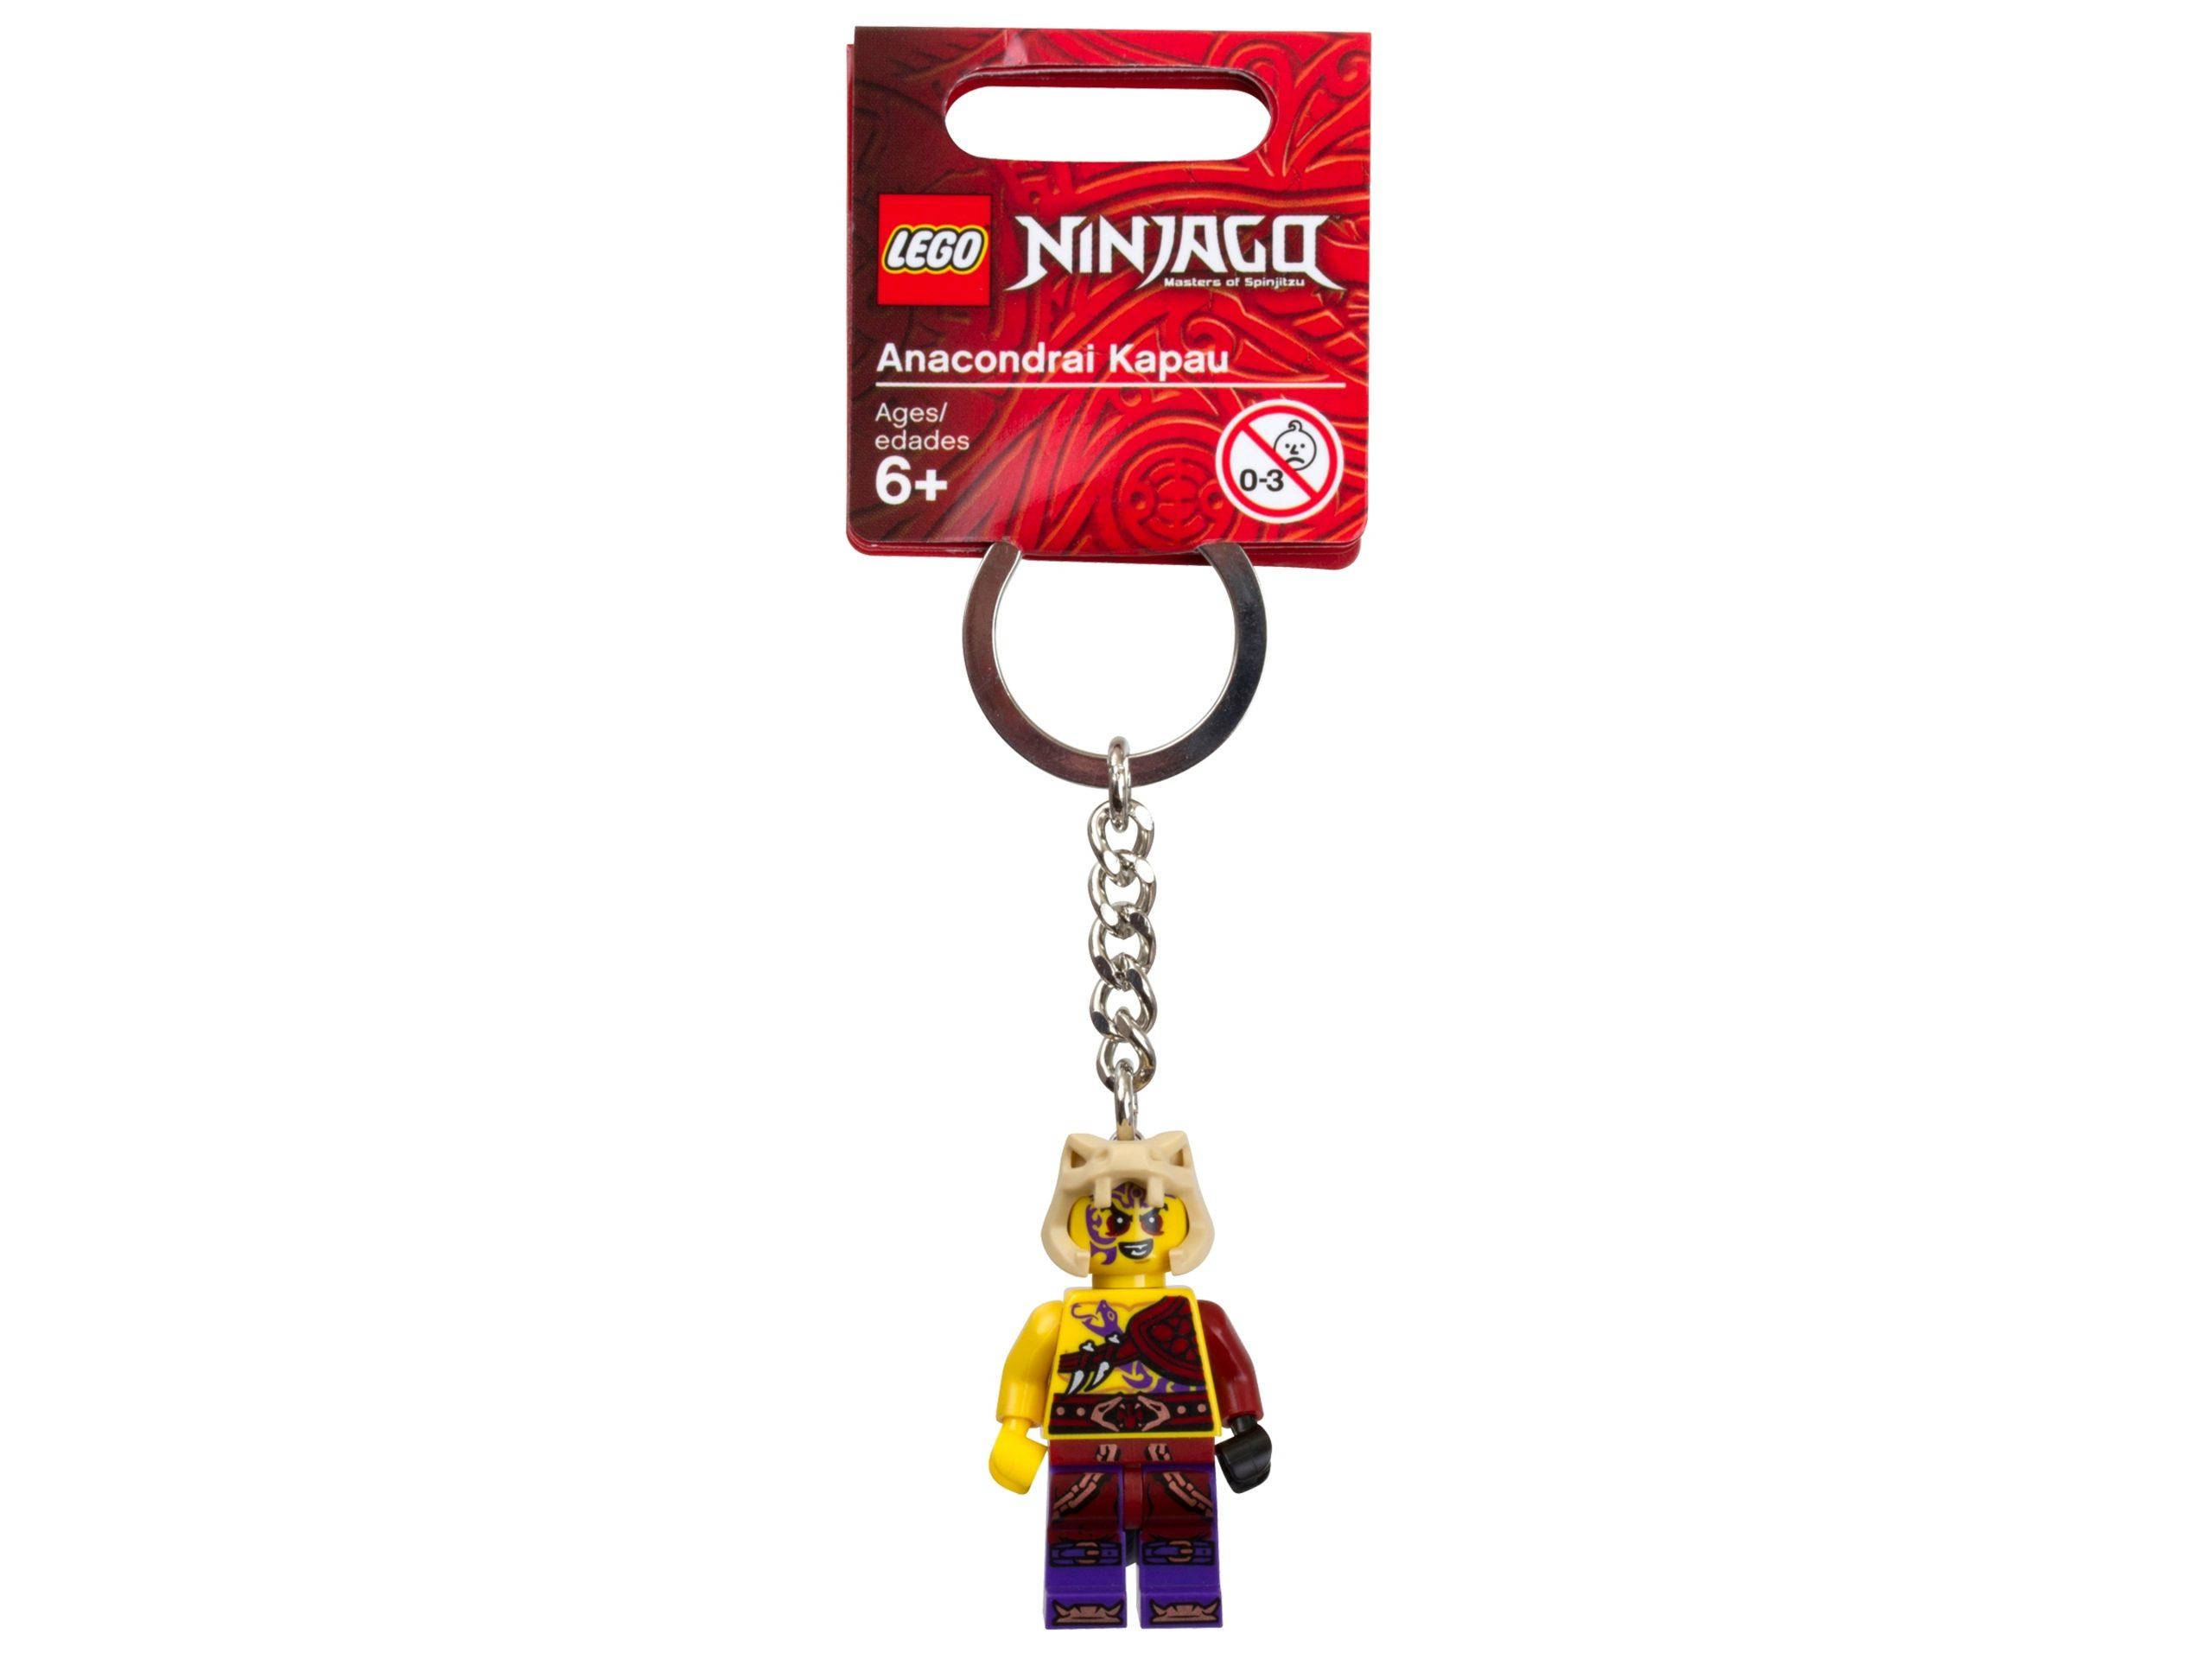 lego 851353 ninjago anacondrai kapau key chain scaled